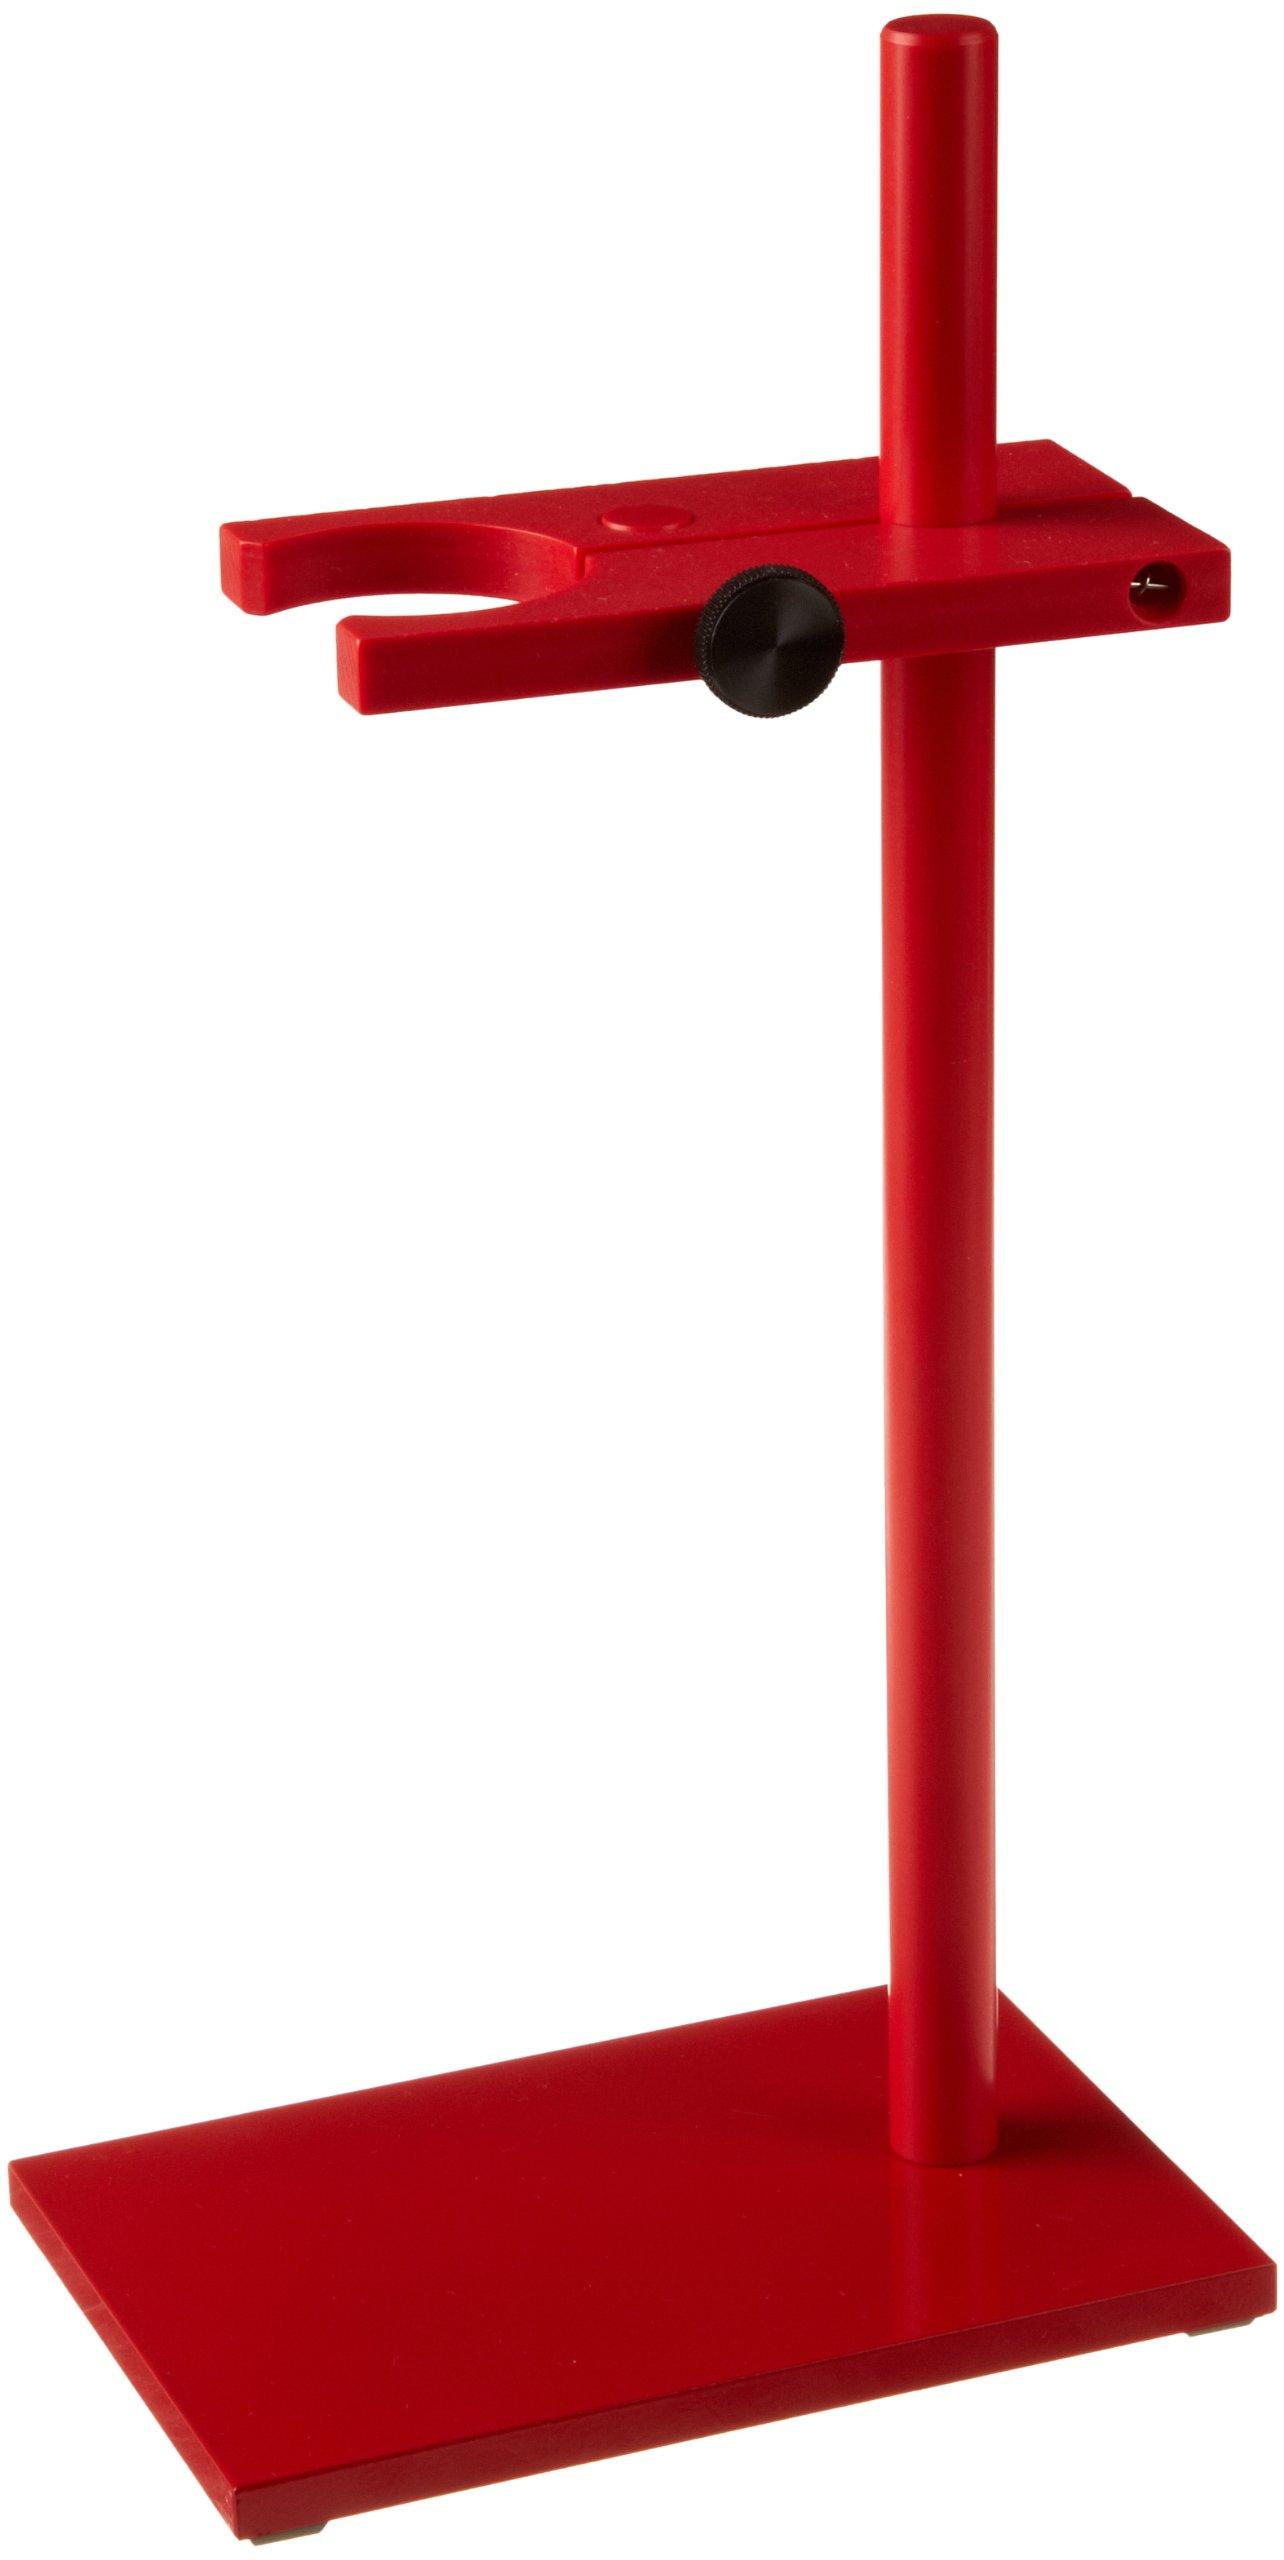 Wheaton Calibrex W844136 Dispenser Stand for Bottle Top Dispenser